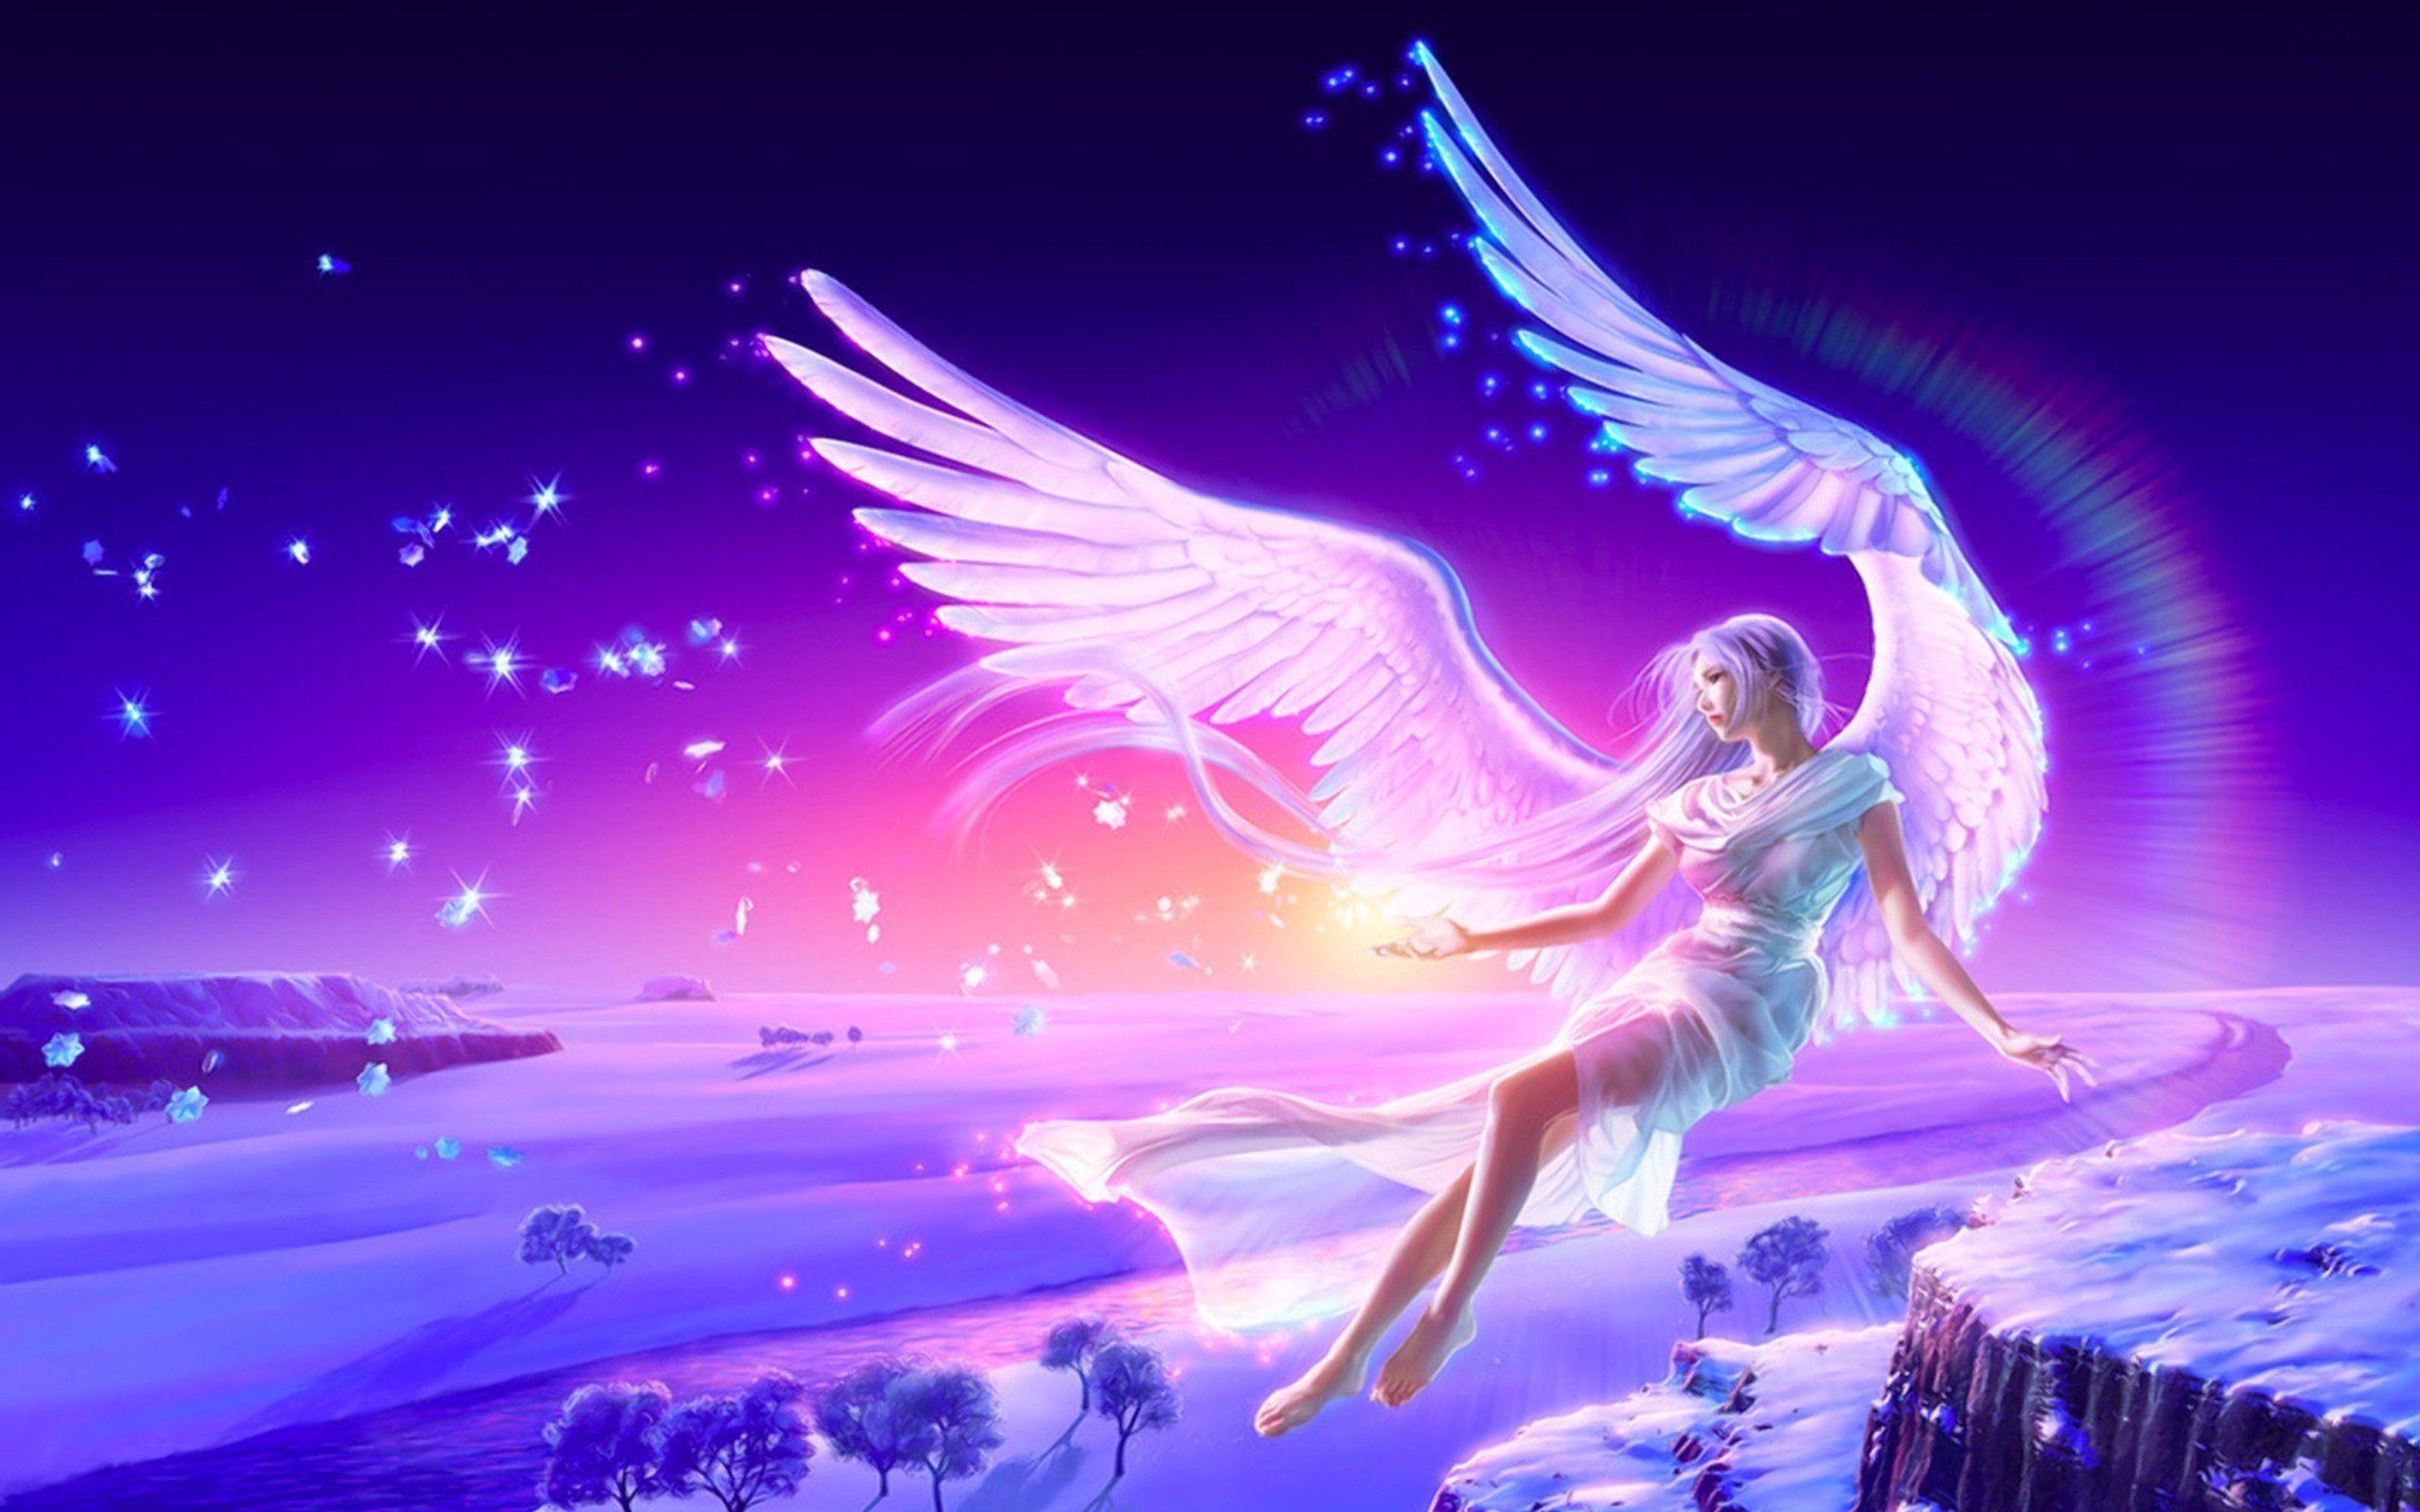 Anime Angels Wallpapers | New Anime Angel Full HD Wallpaper #4764